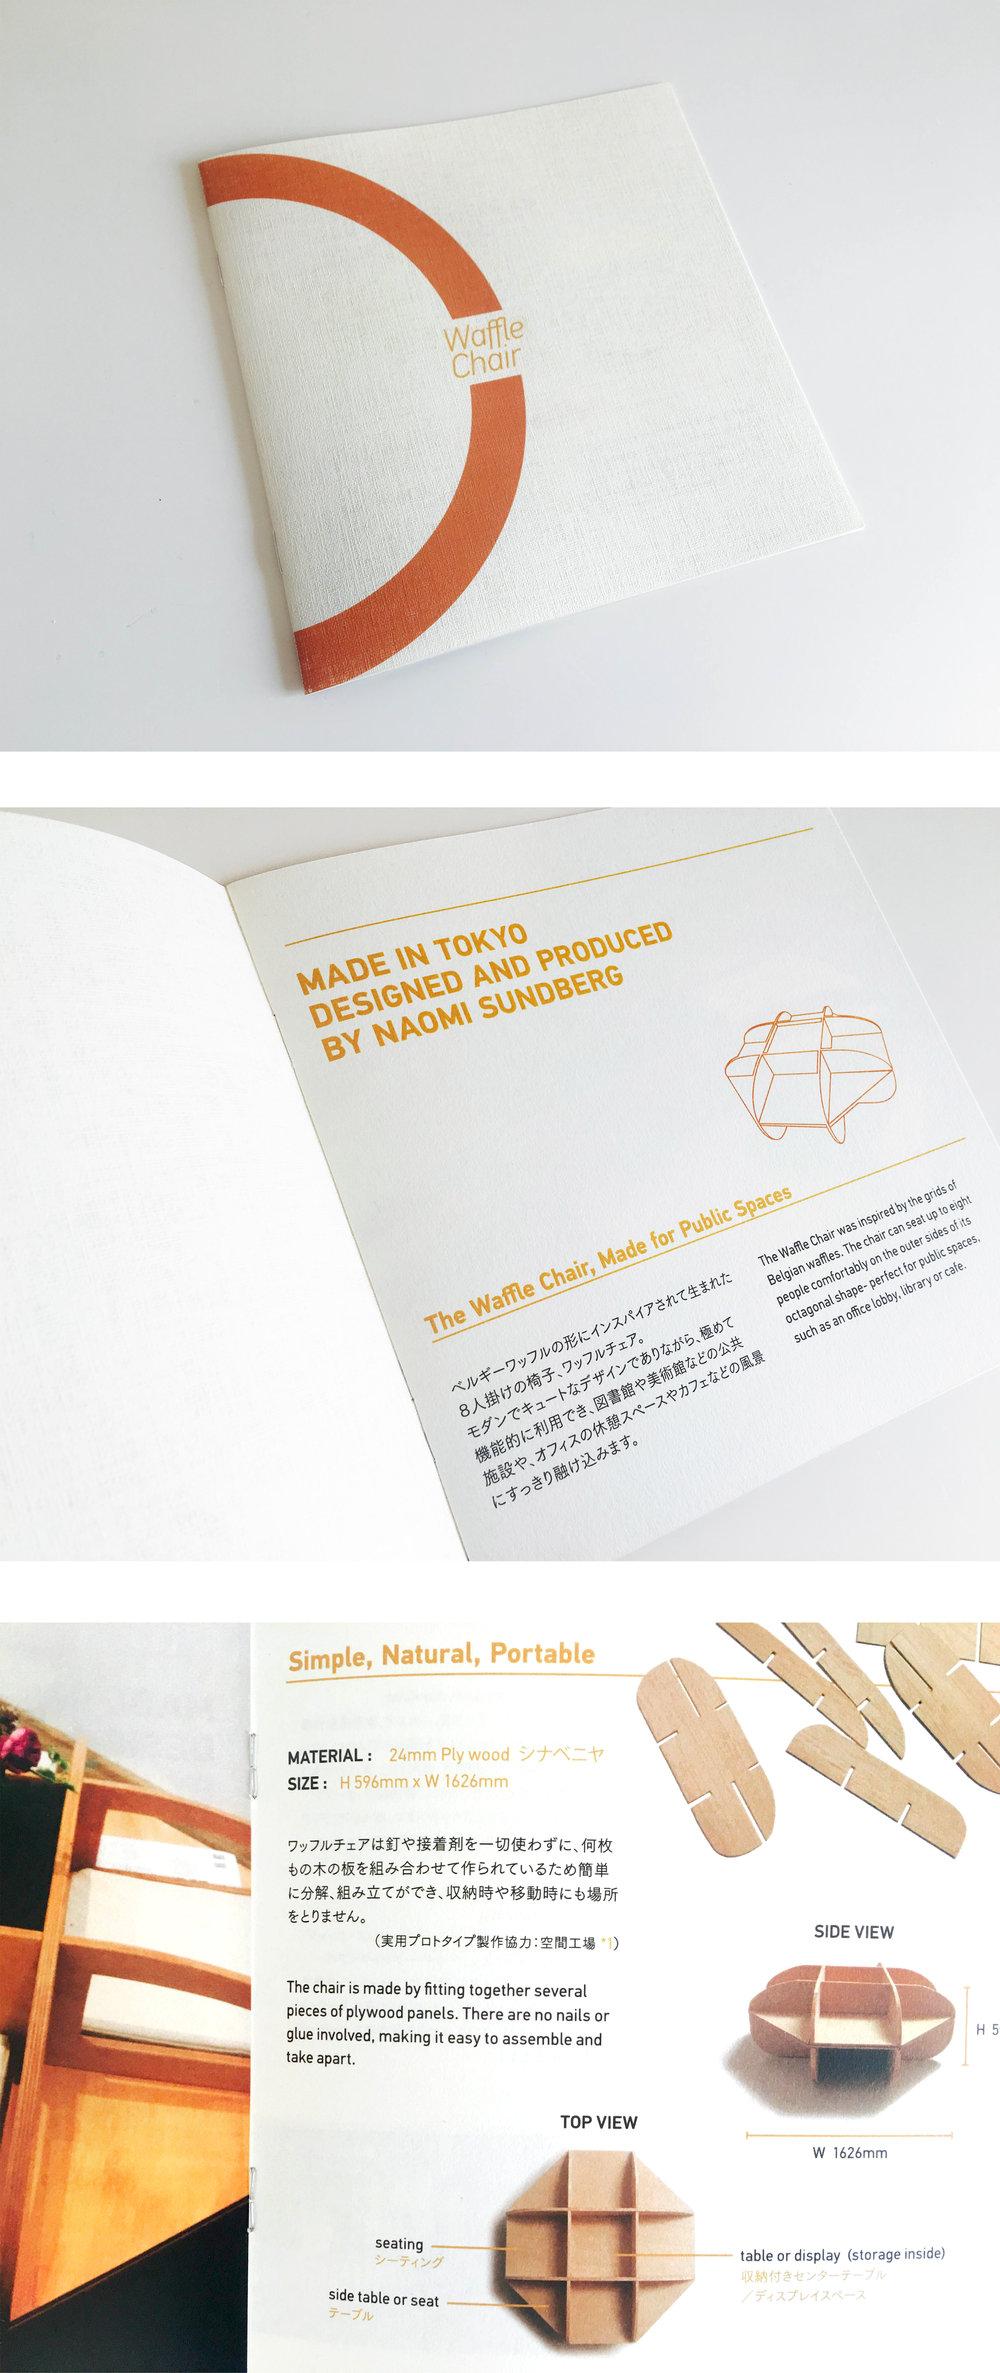 designPortfolio_wafflebook.jpg